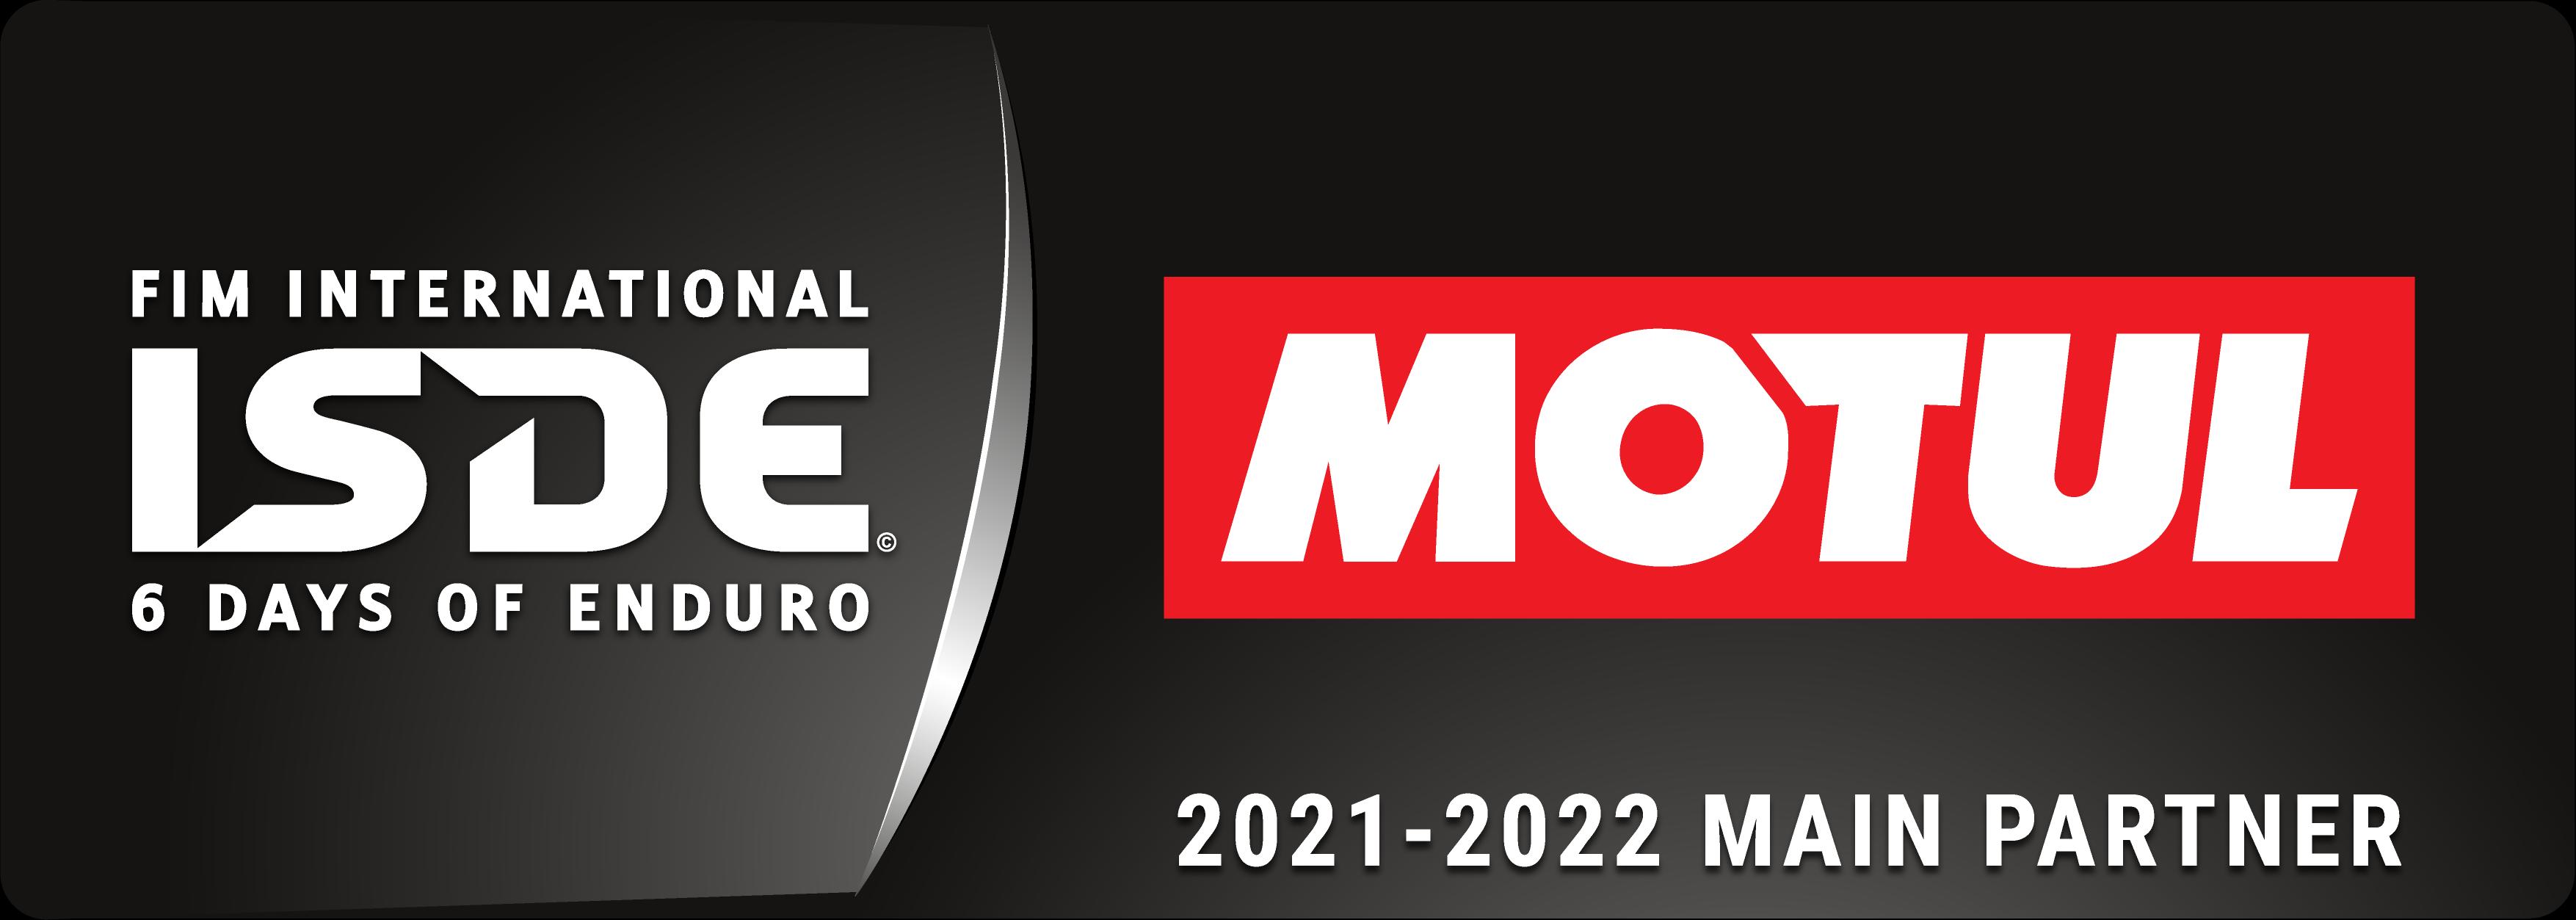 ISDE2021-22-Motul-H.png